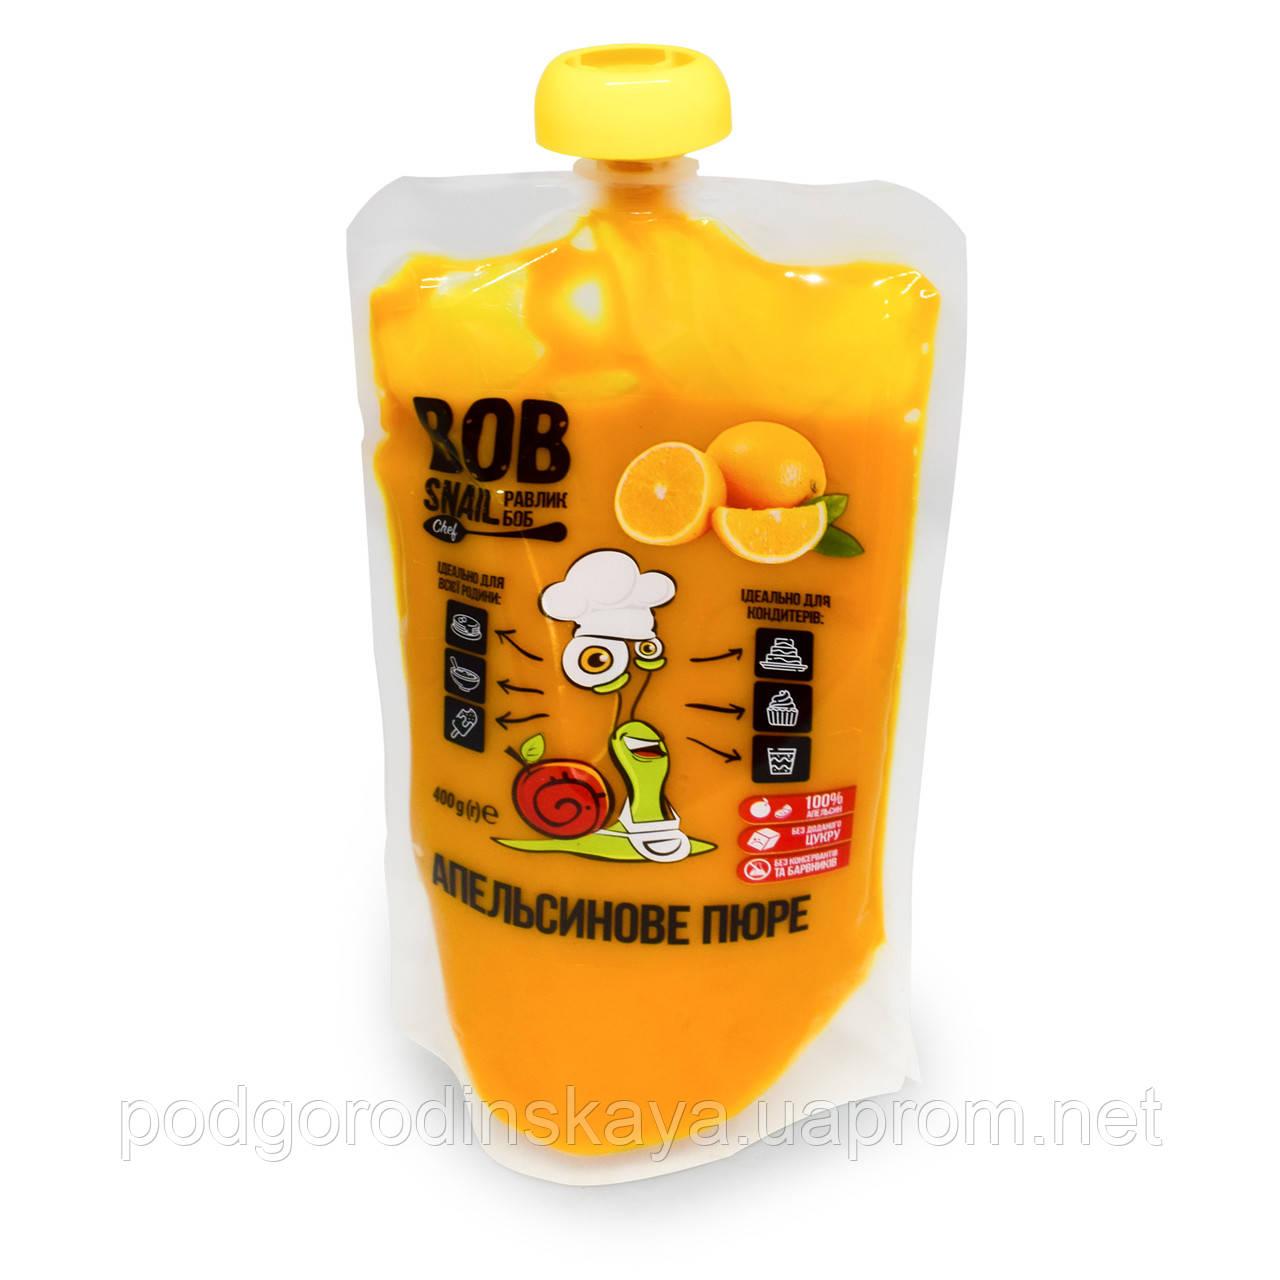 Апельсинове пюре без цукру Snail Bob, 400г